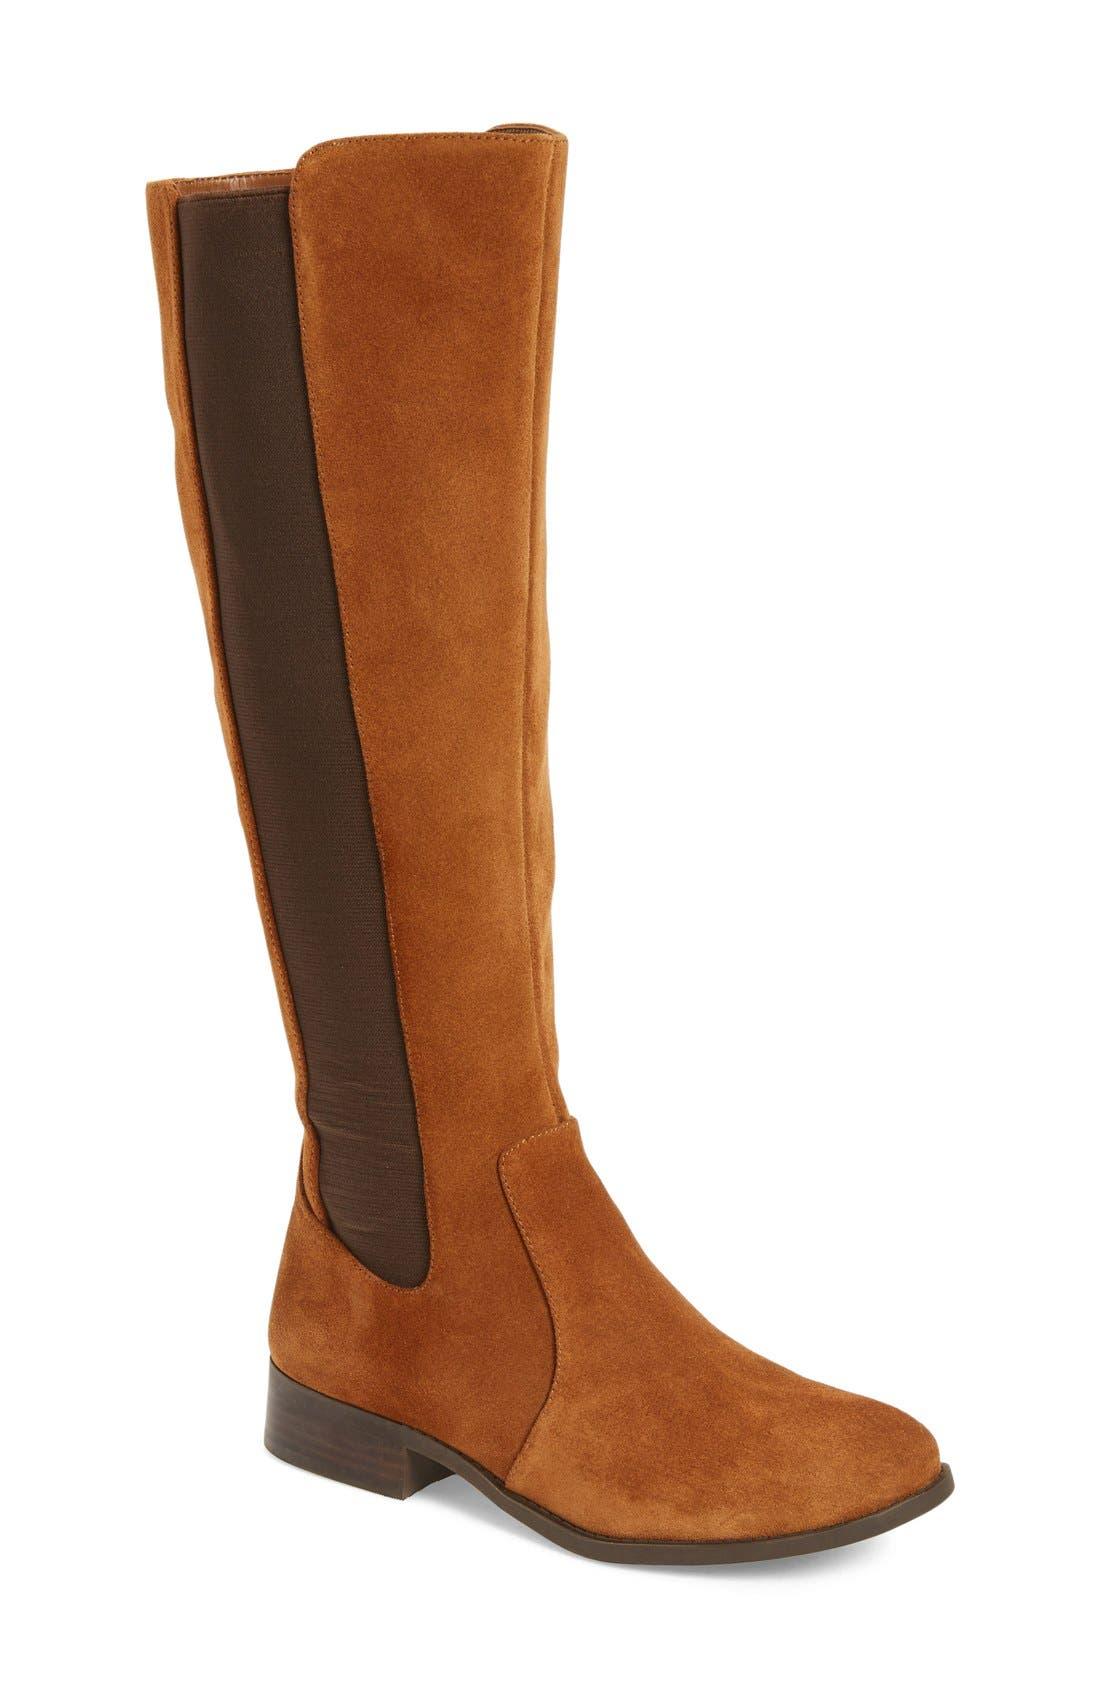 Main Image - Jessica Simpson 'Ricel' Riding Boot (Women) (Regular & Wide Calf)